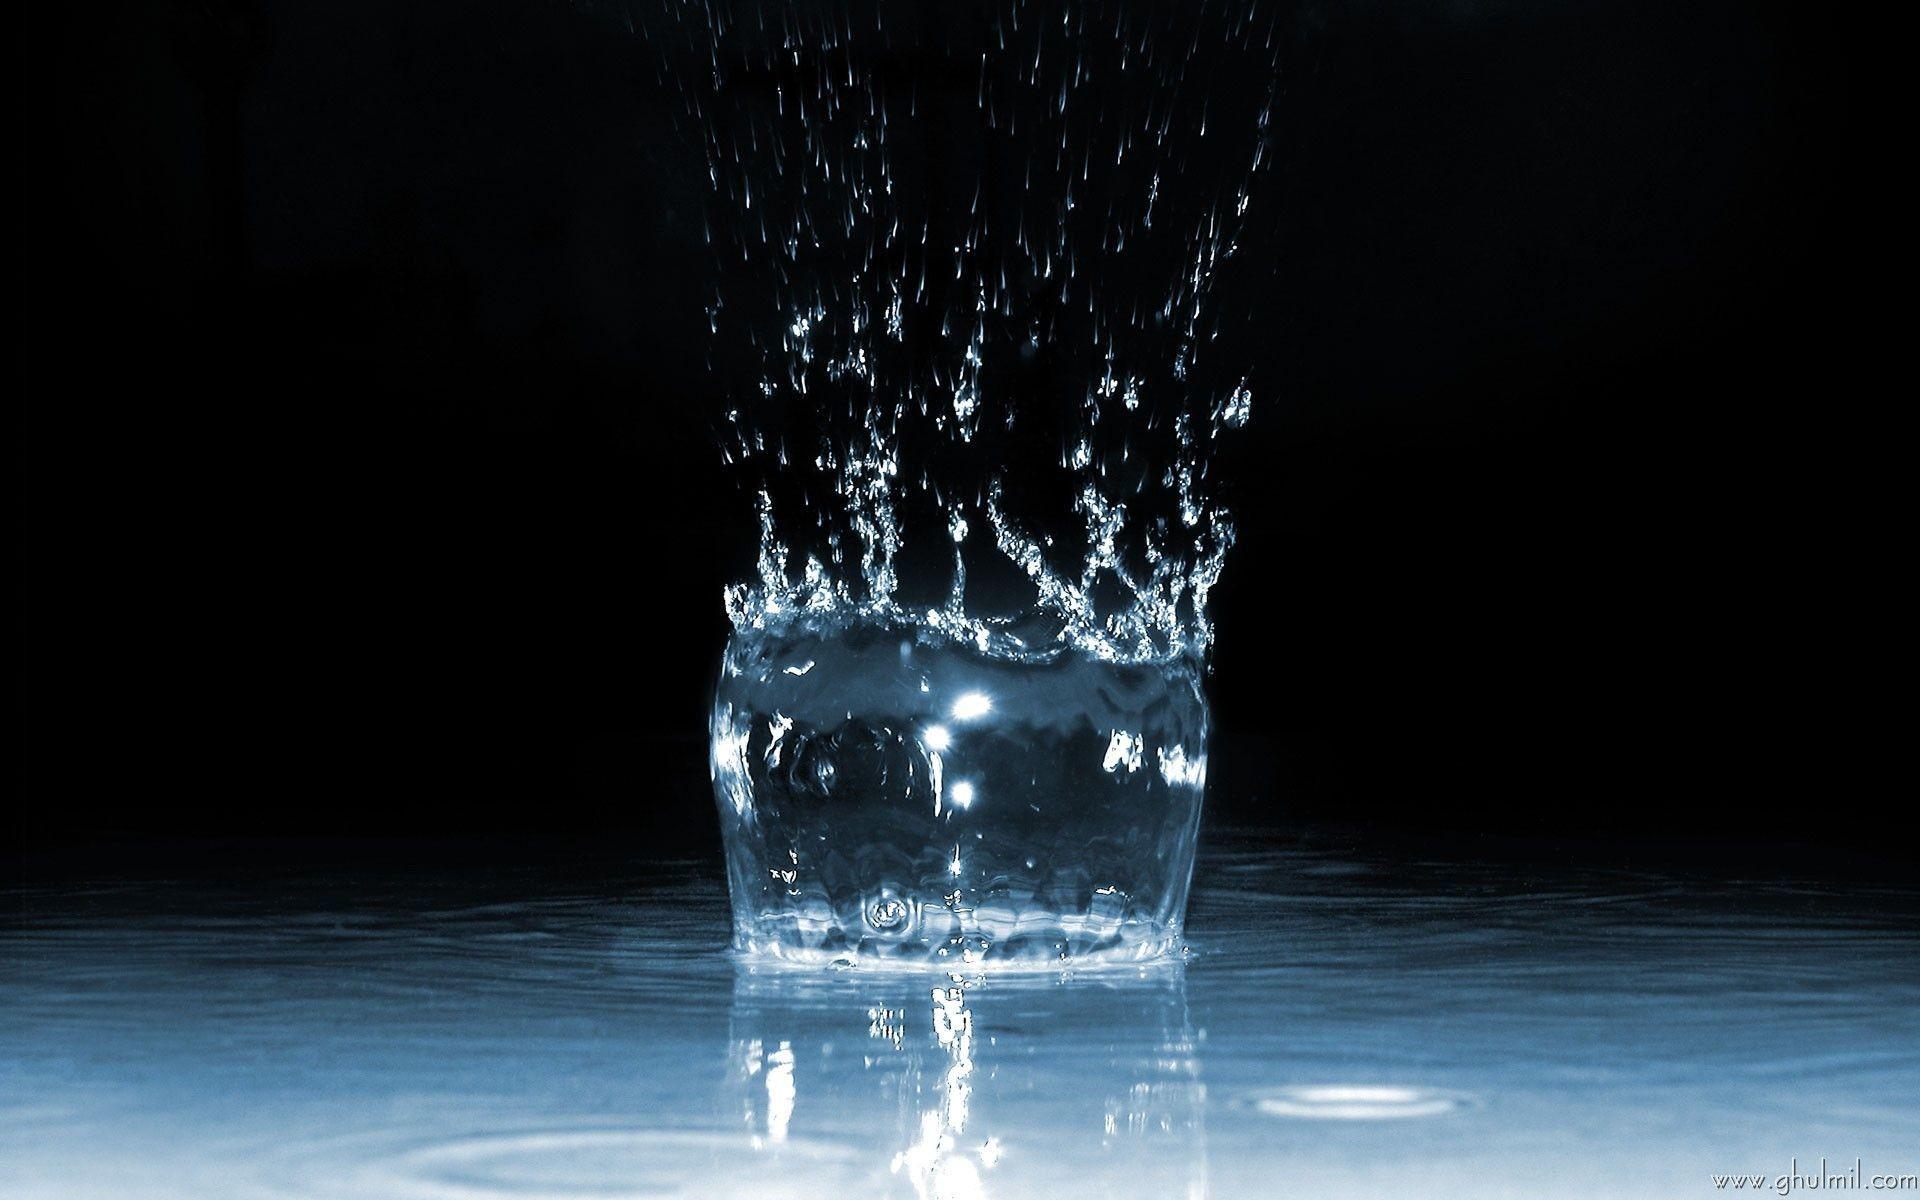 Water Drops HD Wallpaper